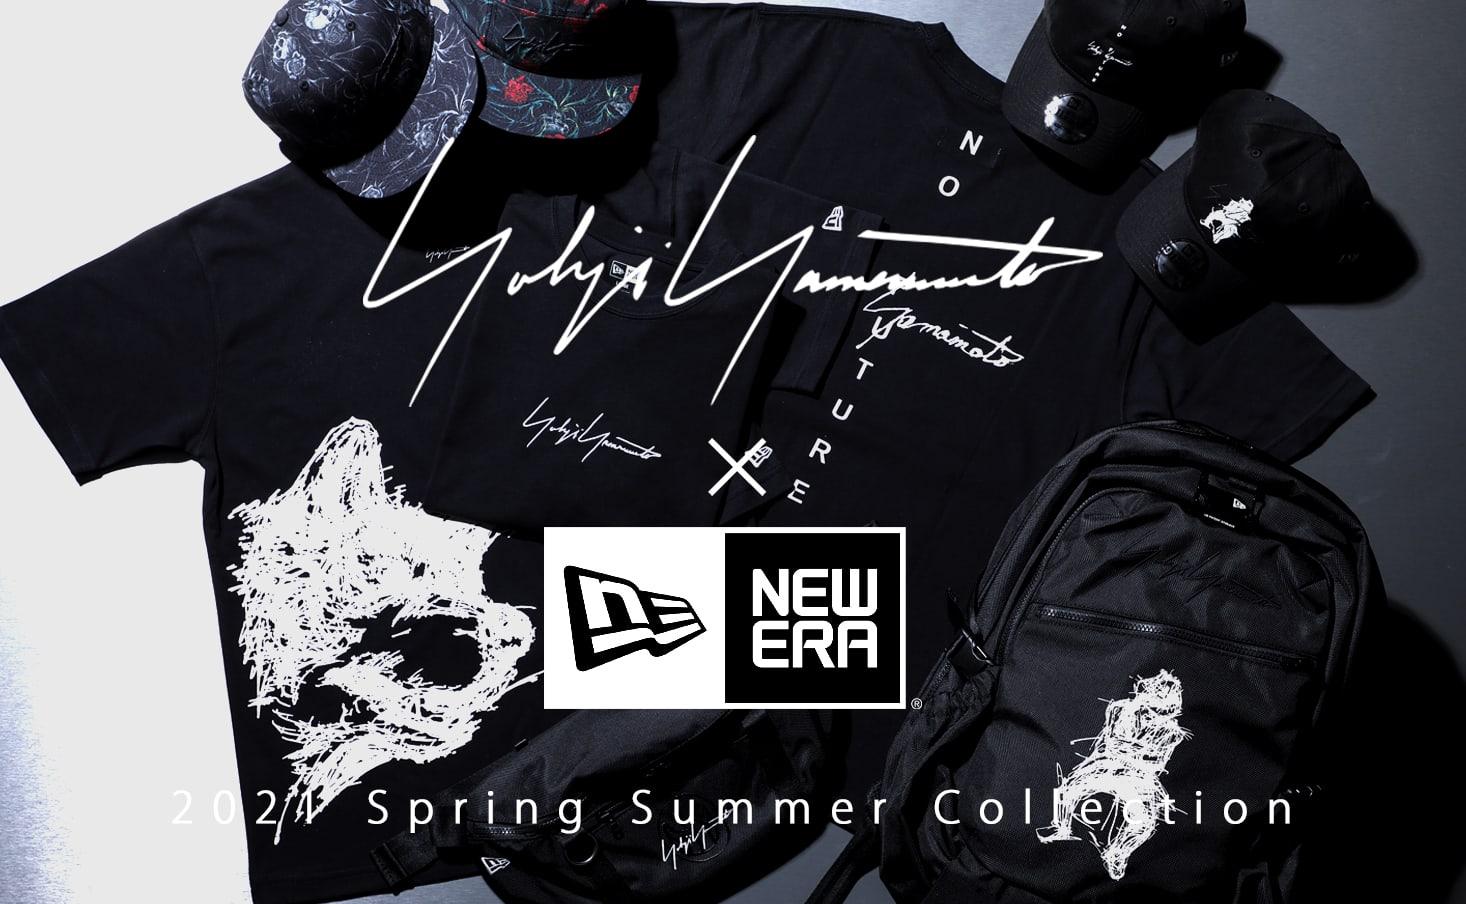 New Era(ニューエラ) × Yohji Yamamoto(ヨウジヤマモト) 2021SS(春夏)コレクション